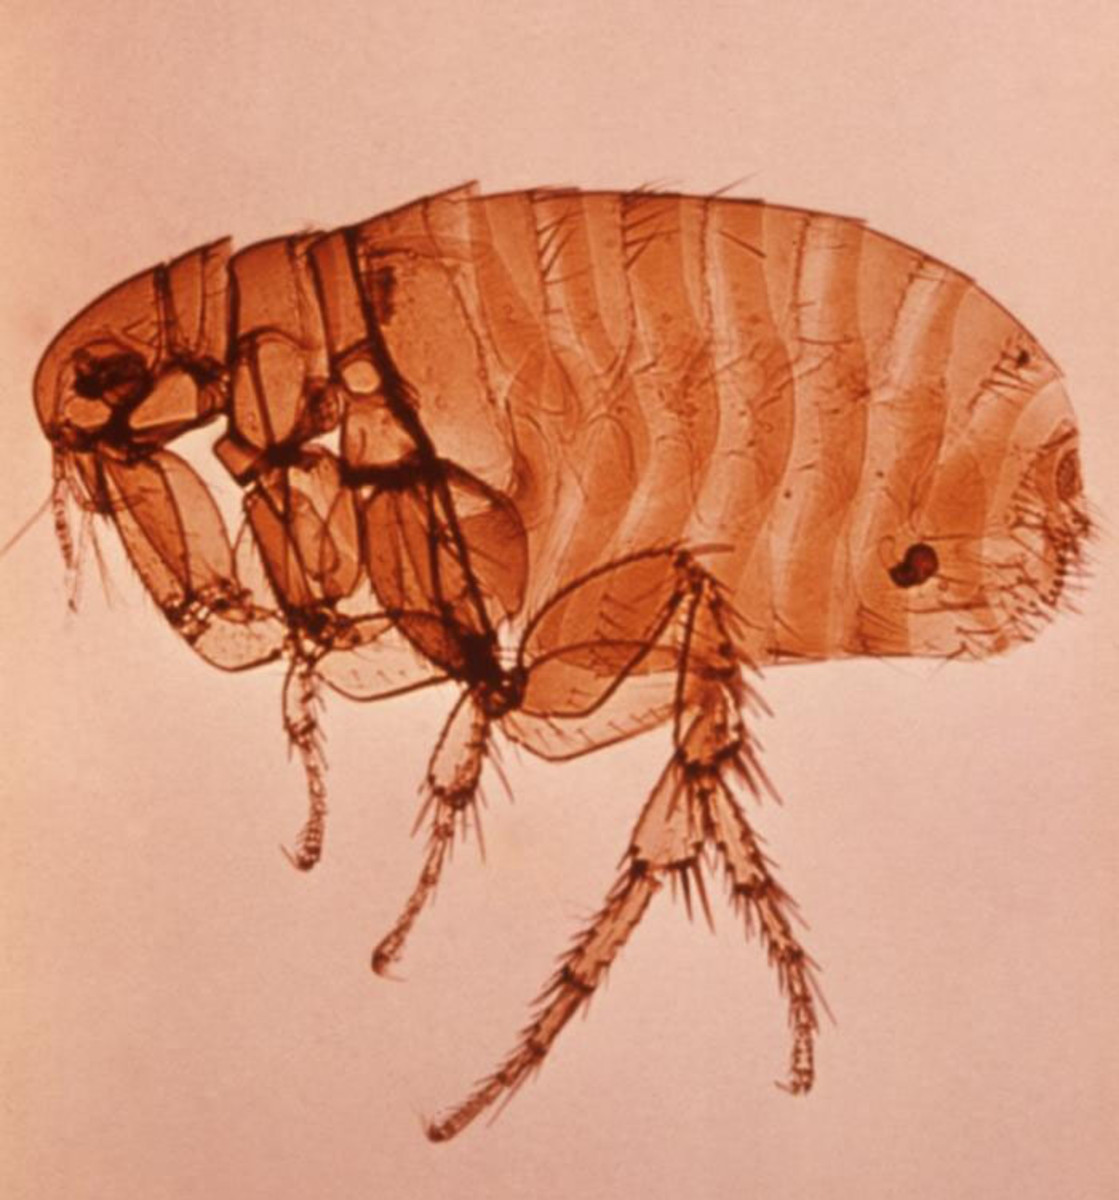 Plague carrying flea